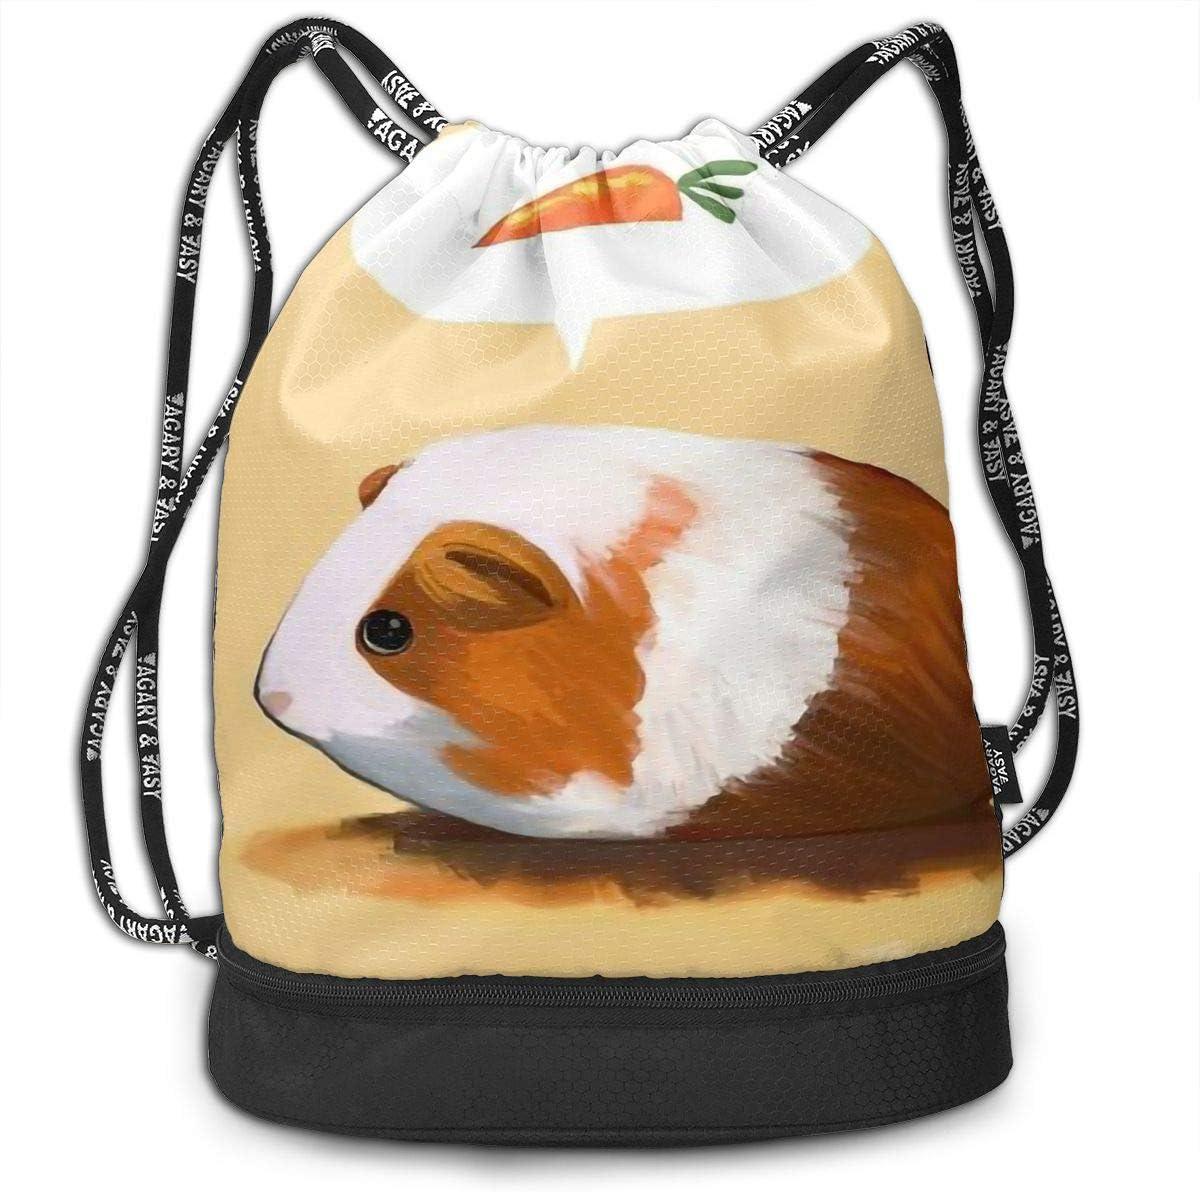 Drawstring Backpack Cute Guinea Pigs Gym Bag